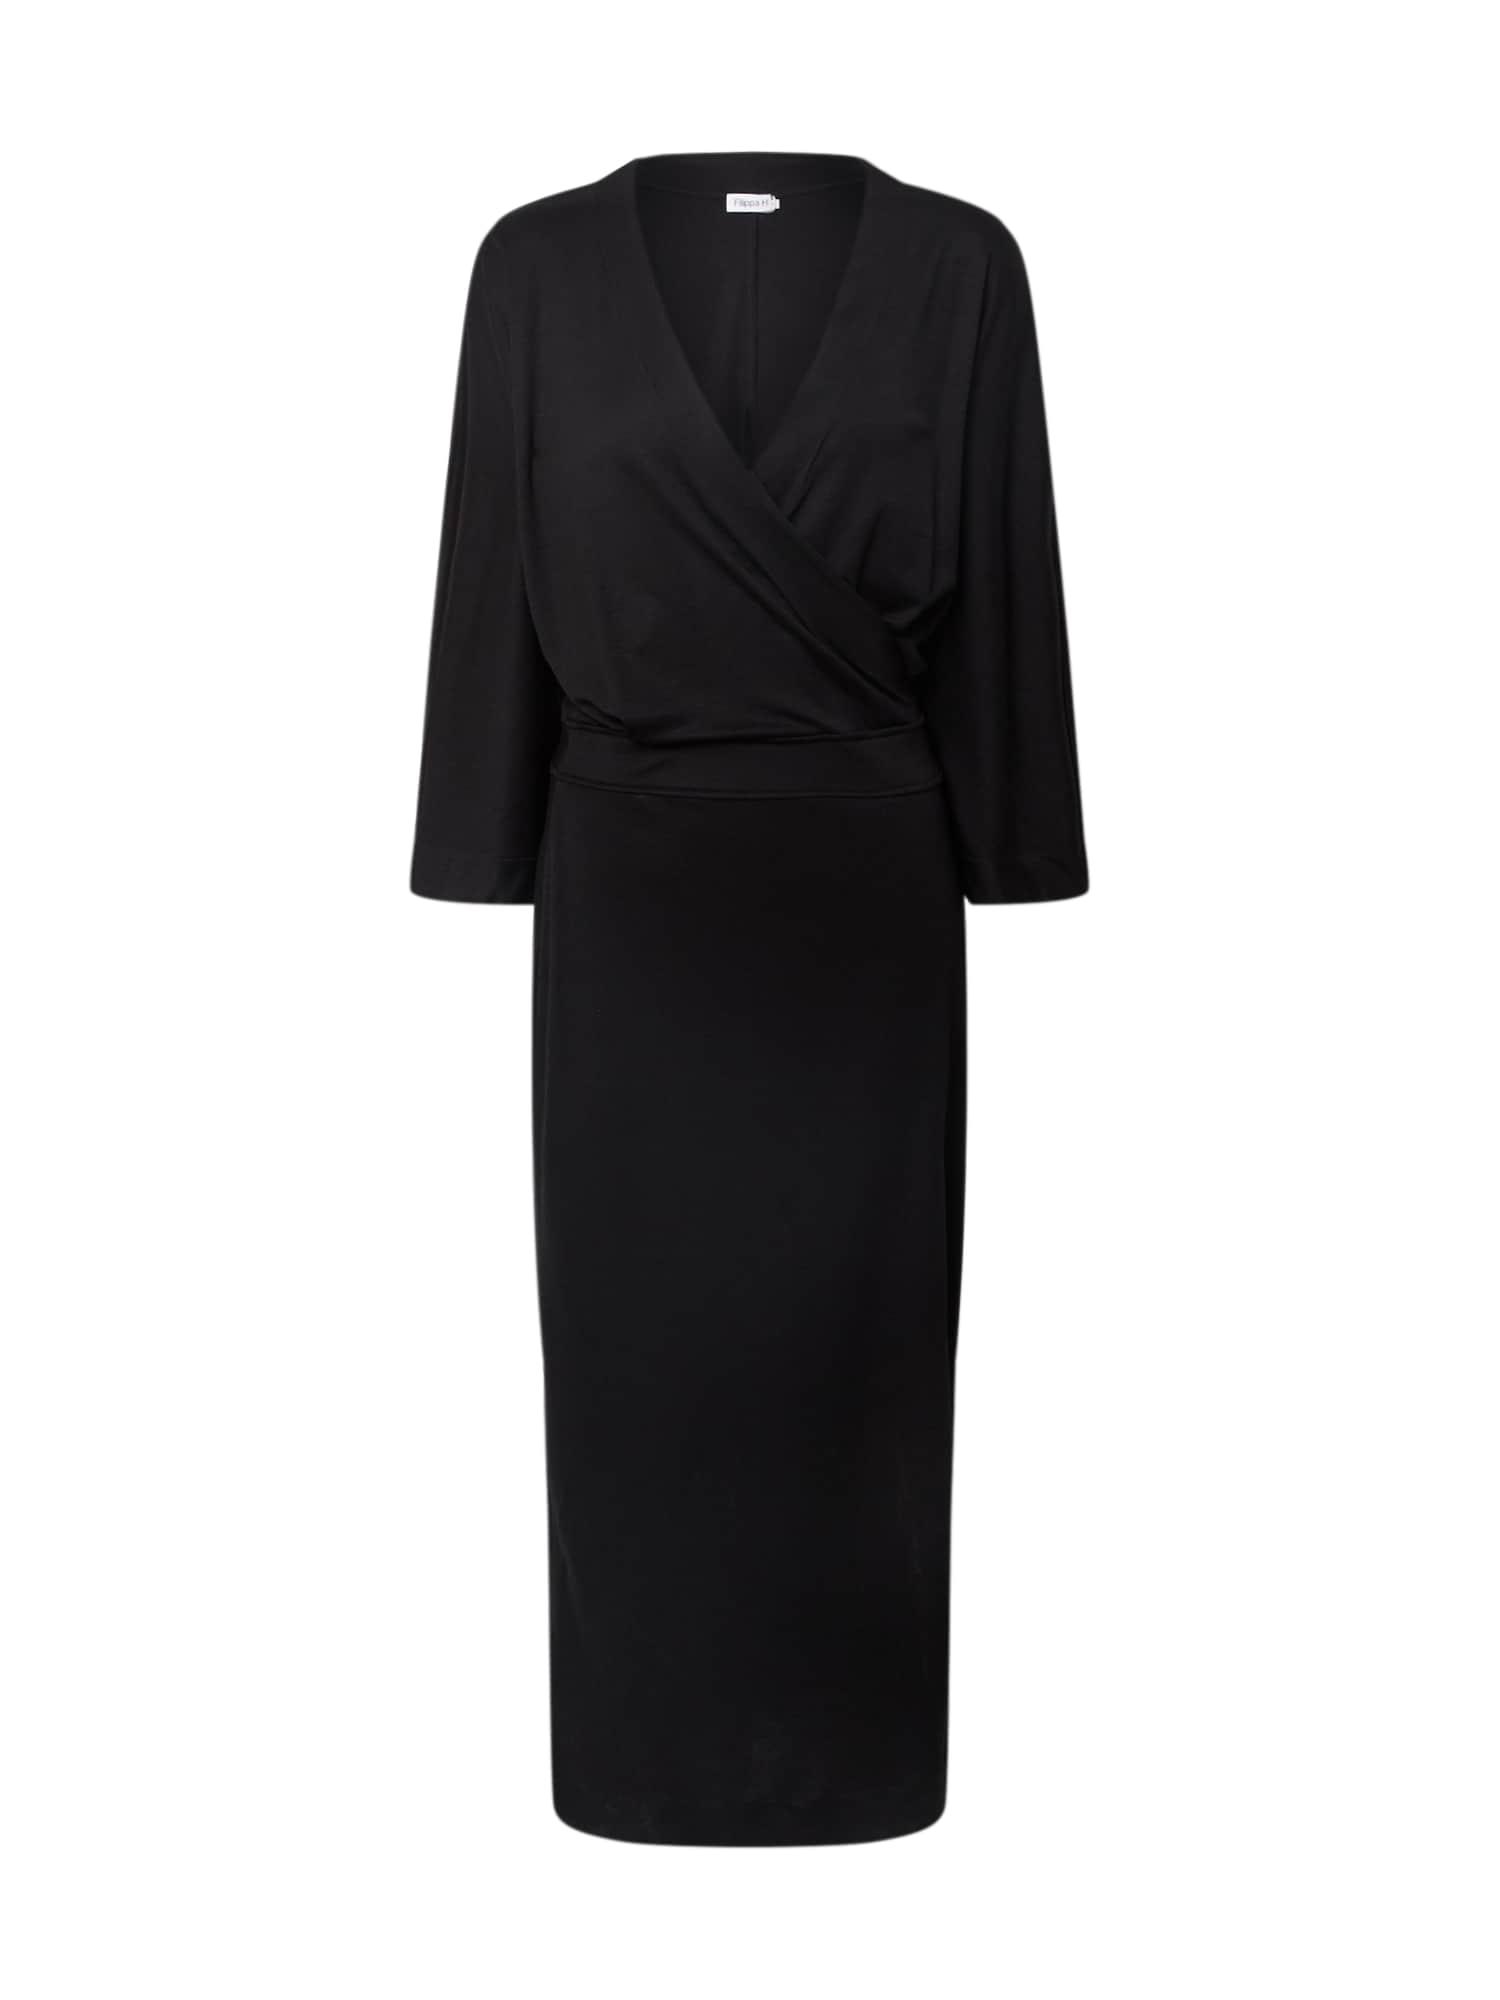 Filippa K Suknelė 'Irene' juoda